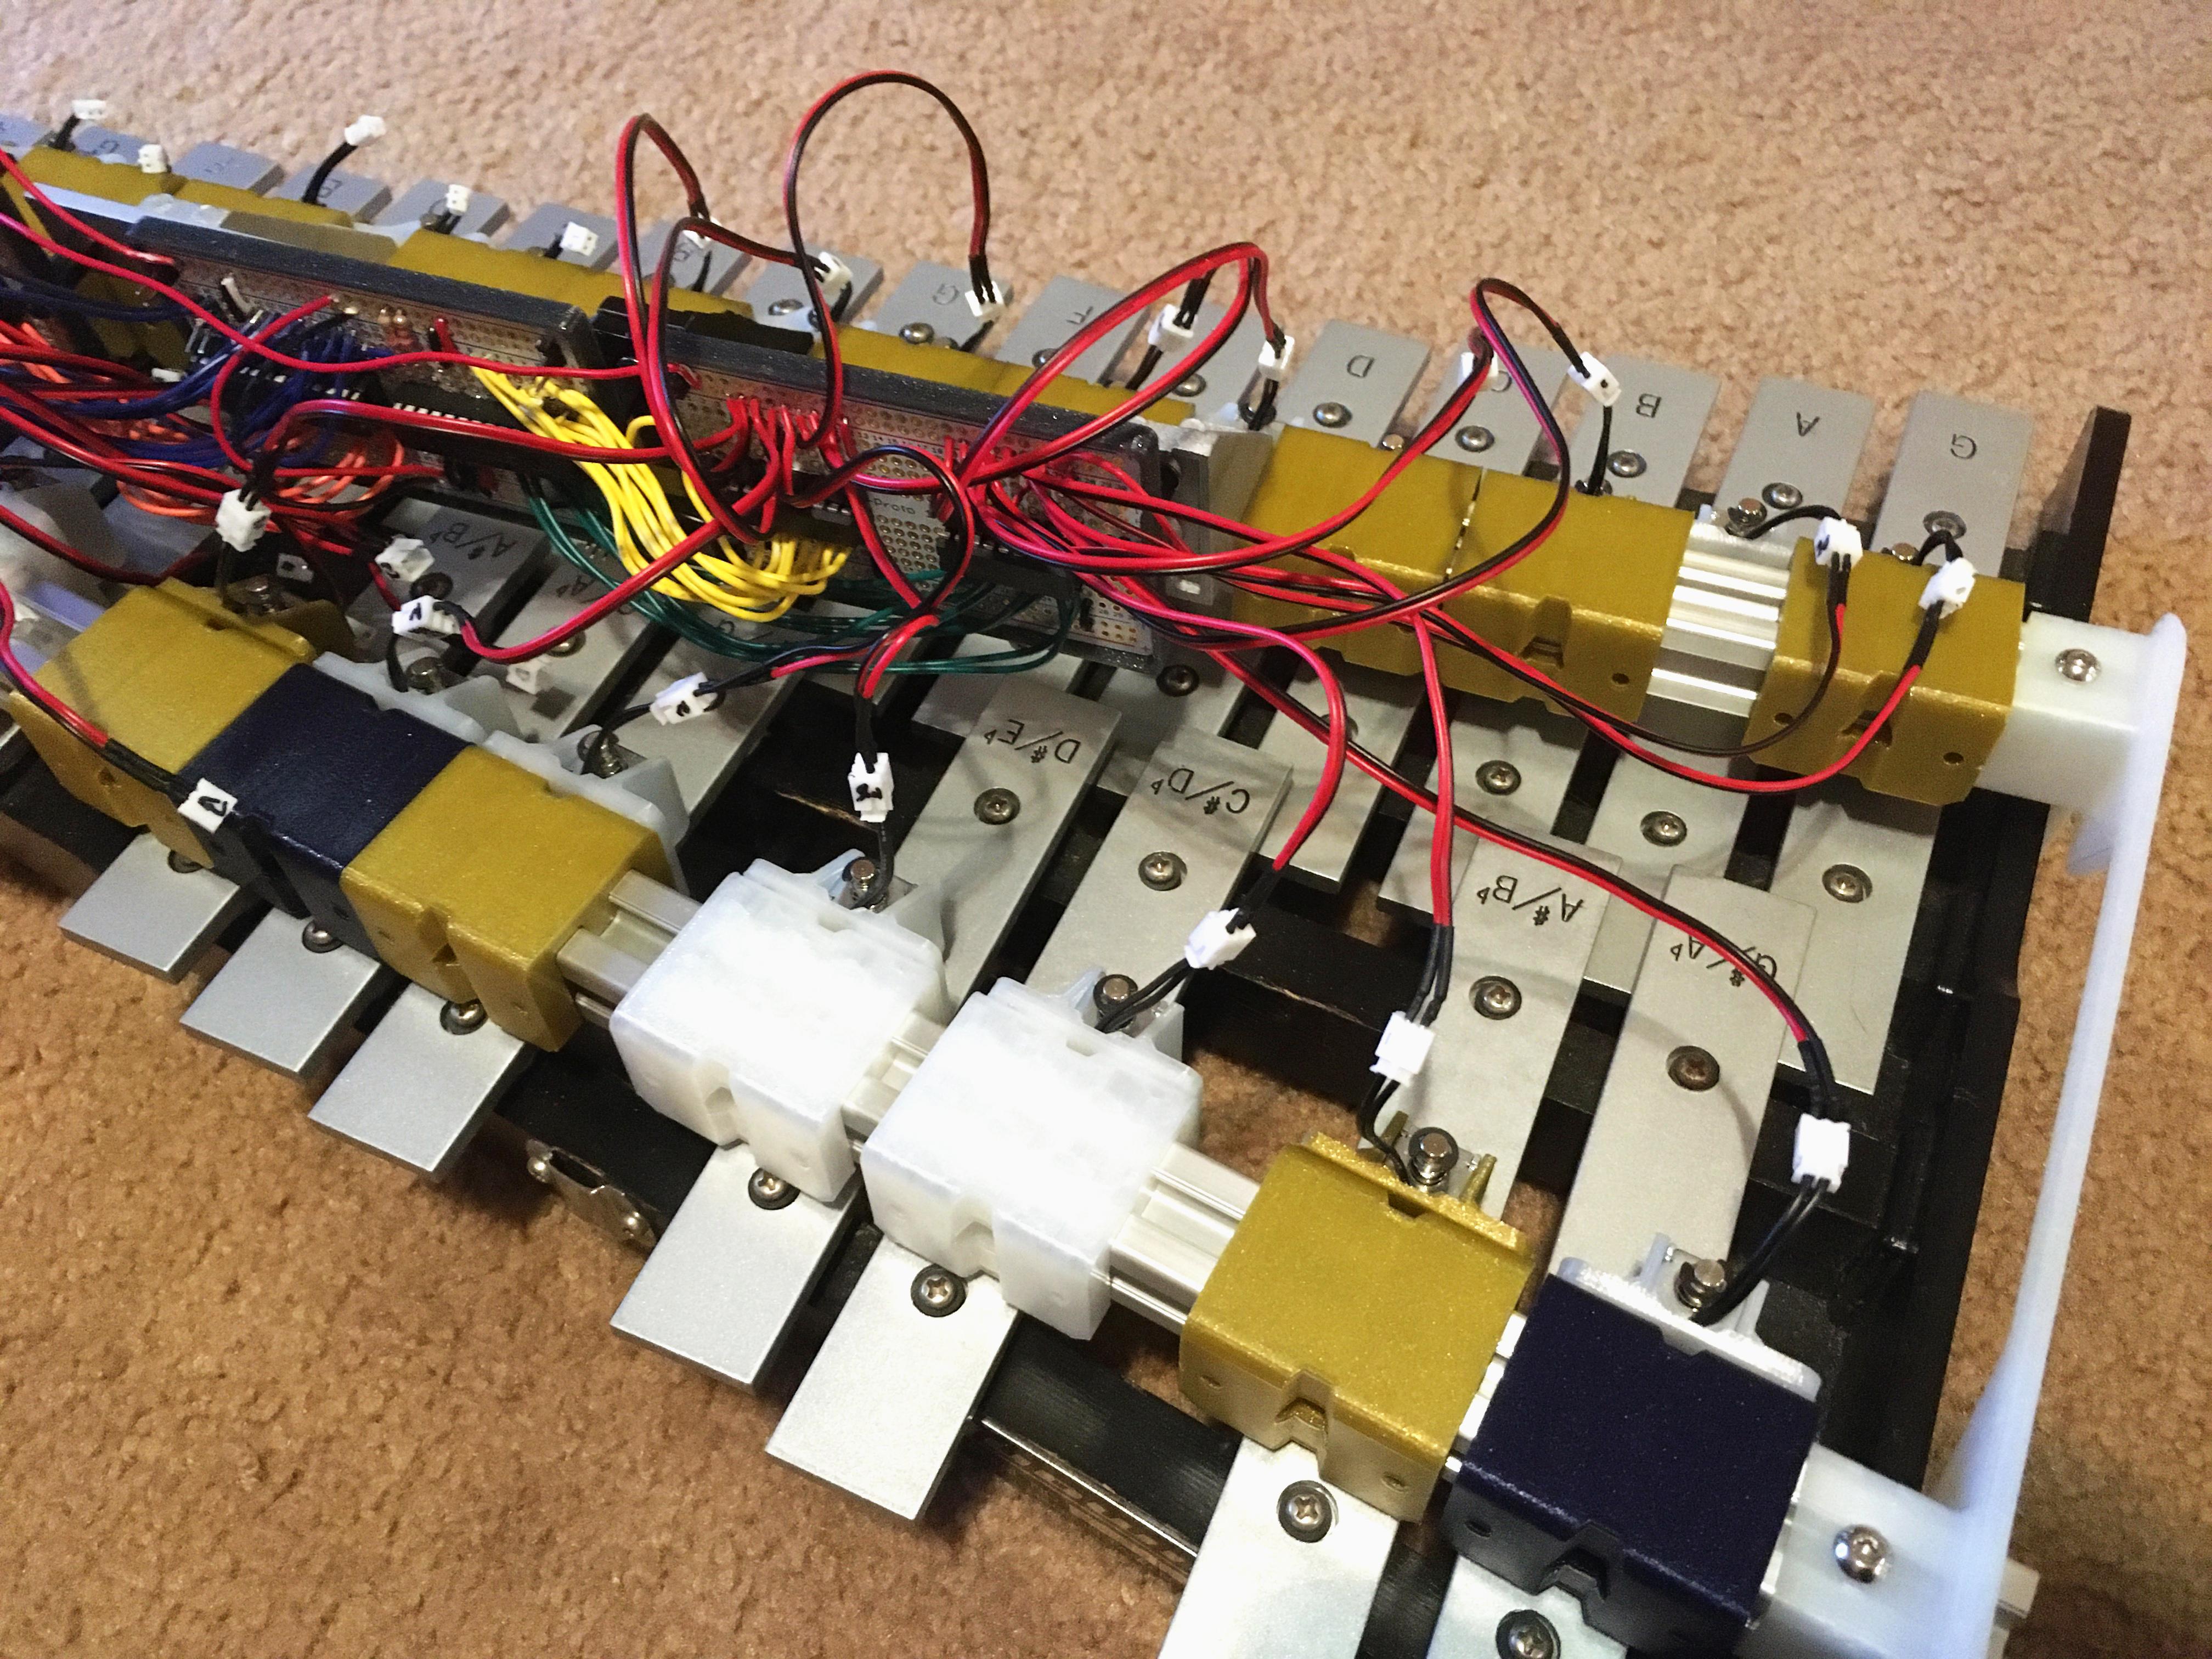 circuitpython_IMG_0015_edited.jpg